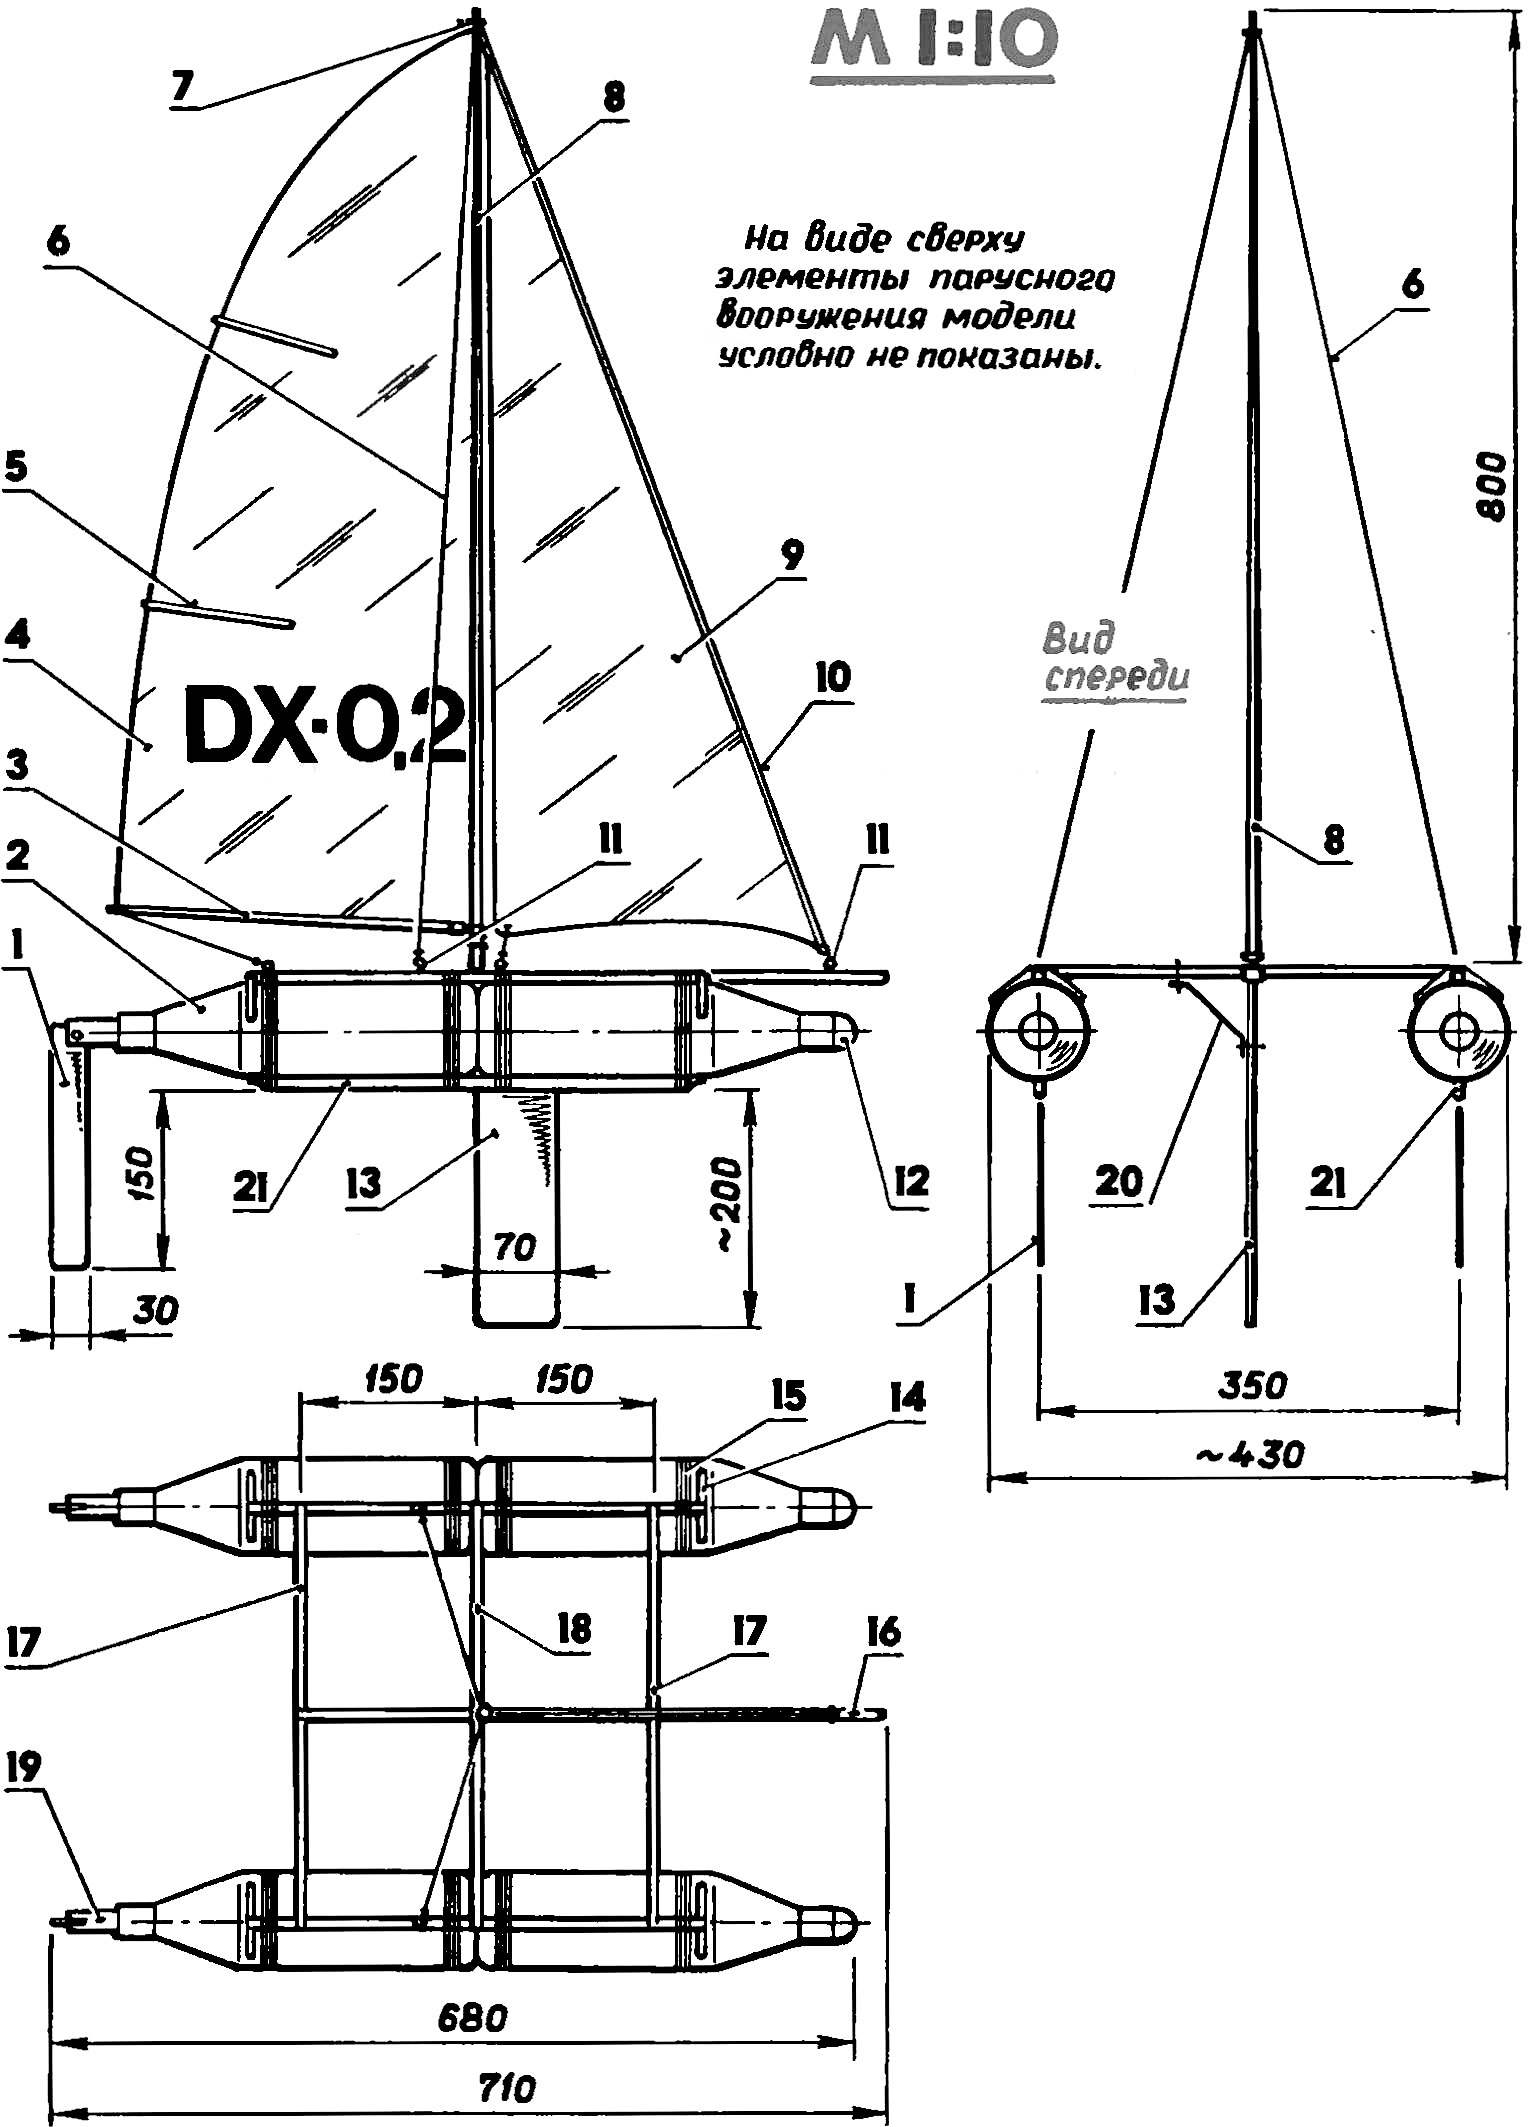 Sailing model yachts-catamaran.